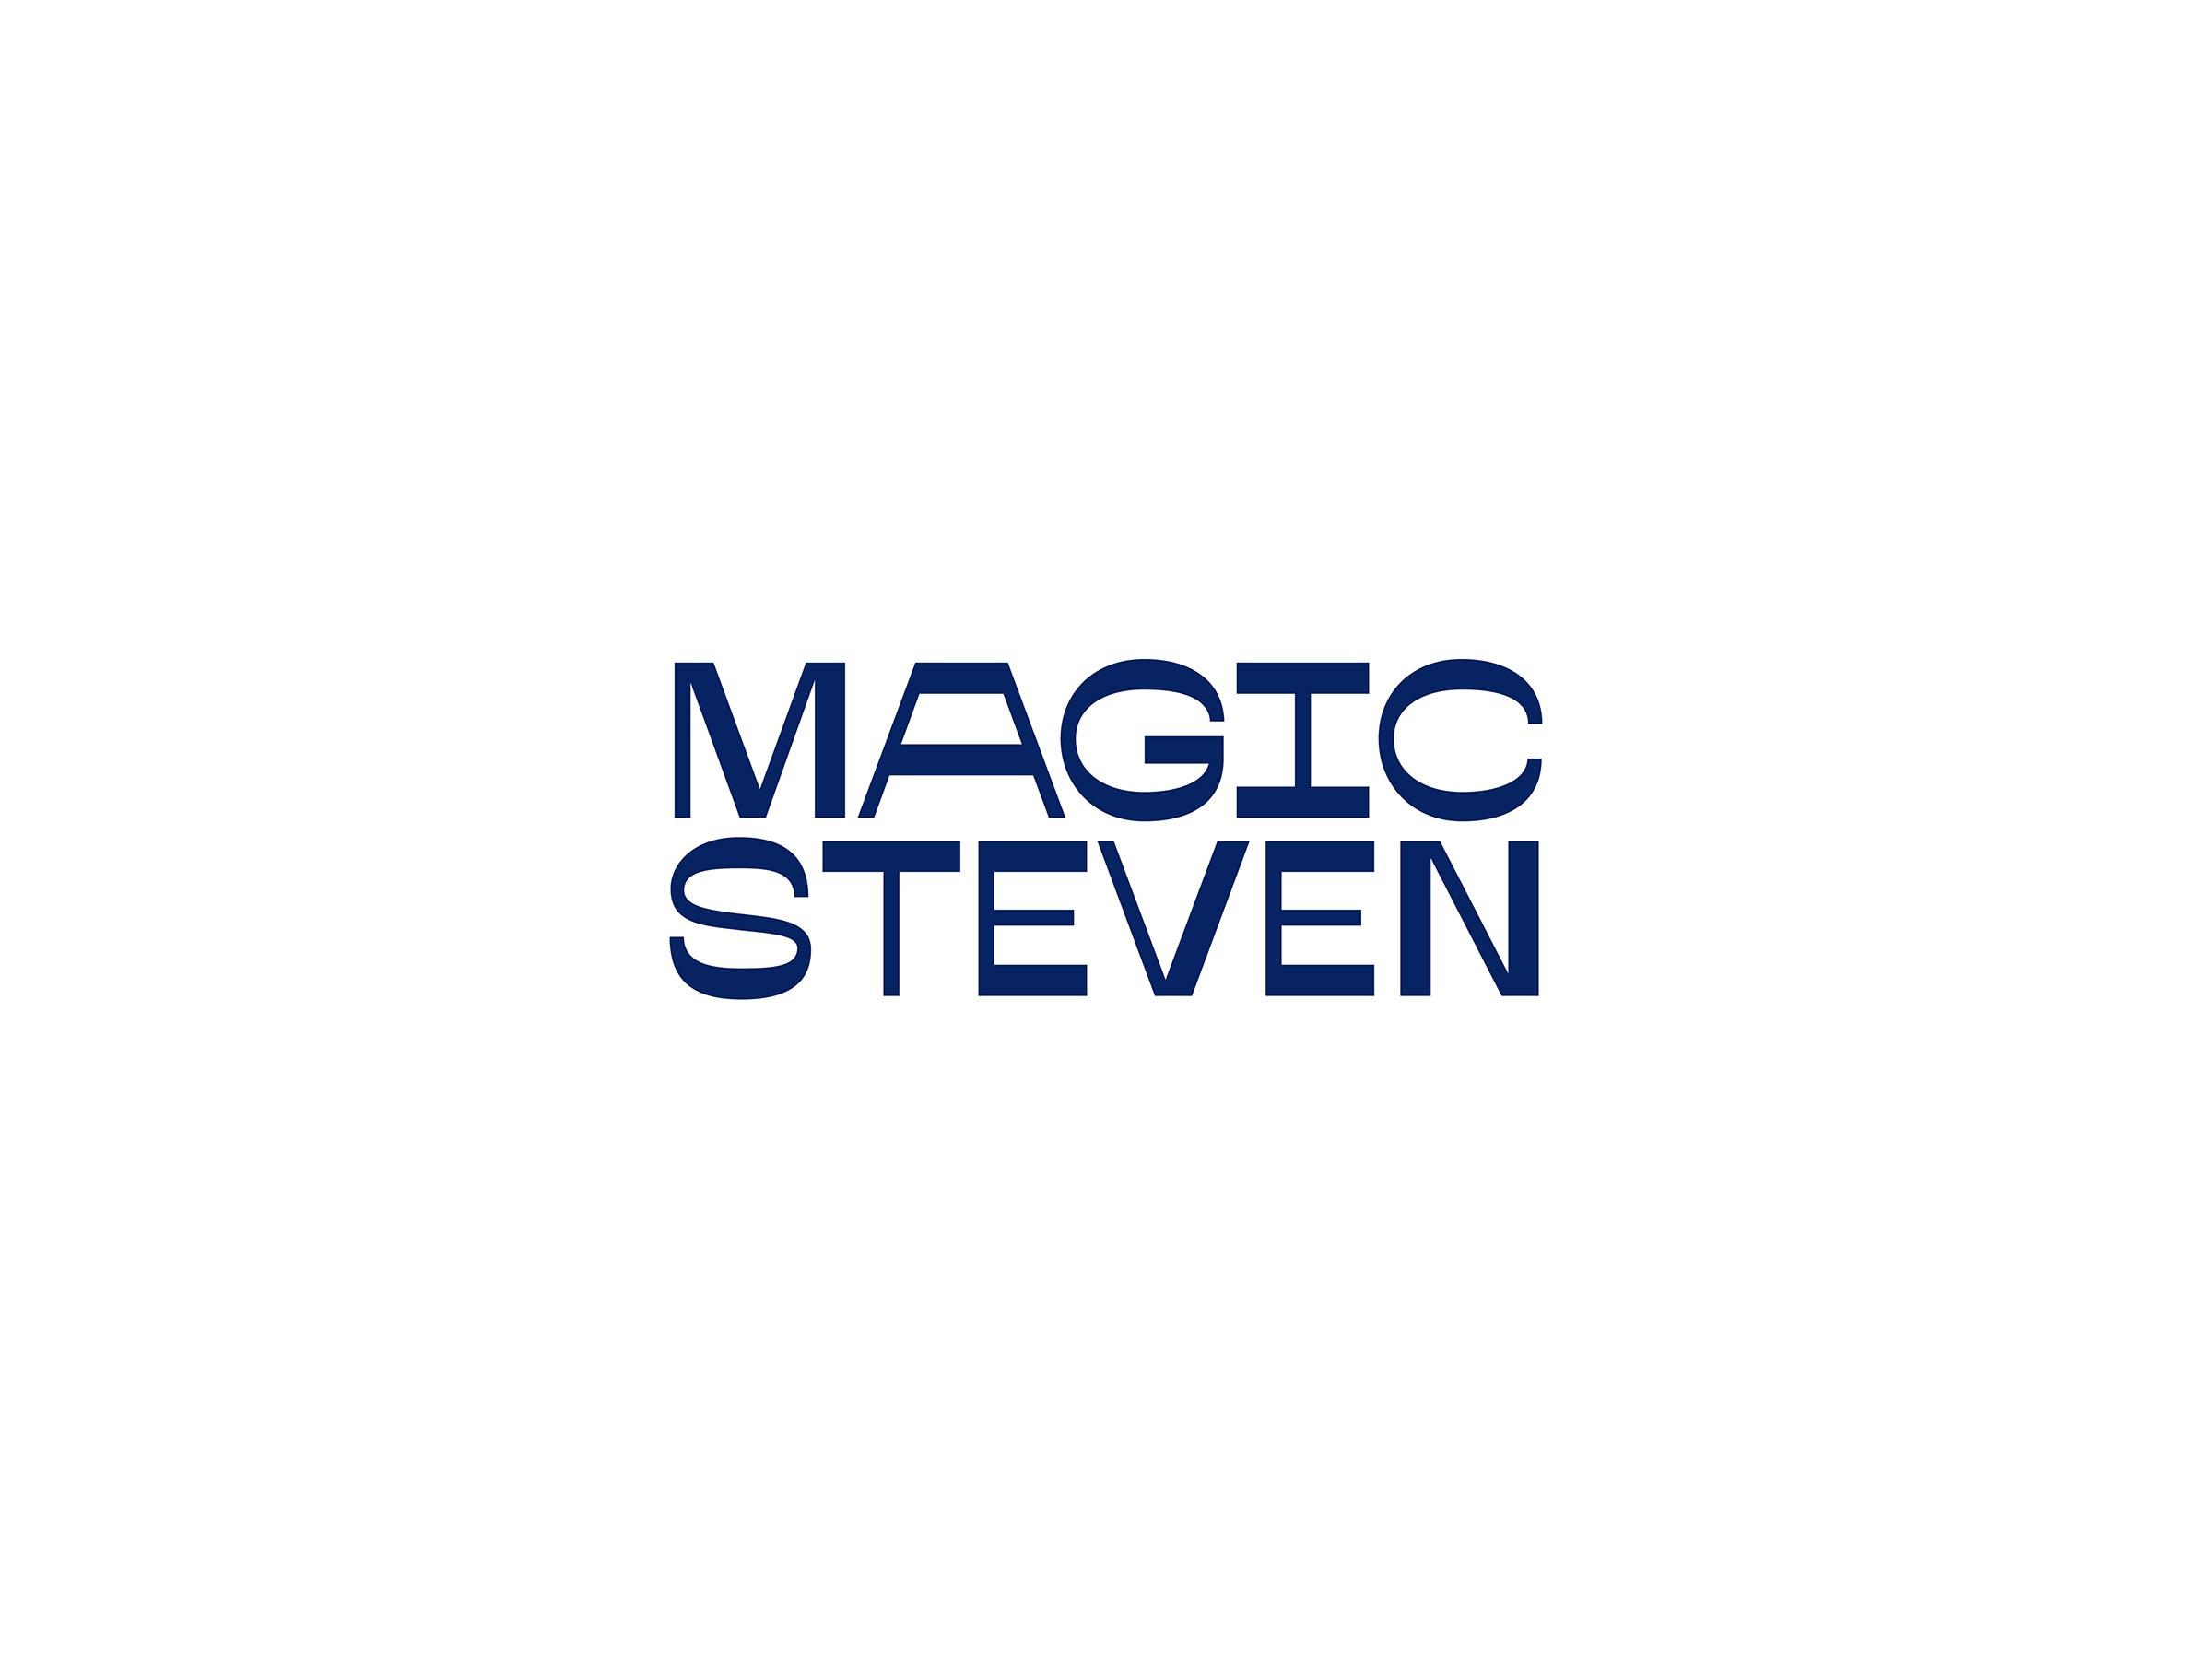 Magic Steven, Note To Self